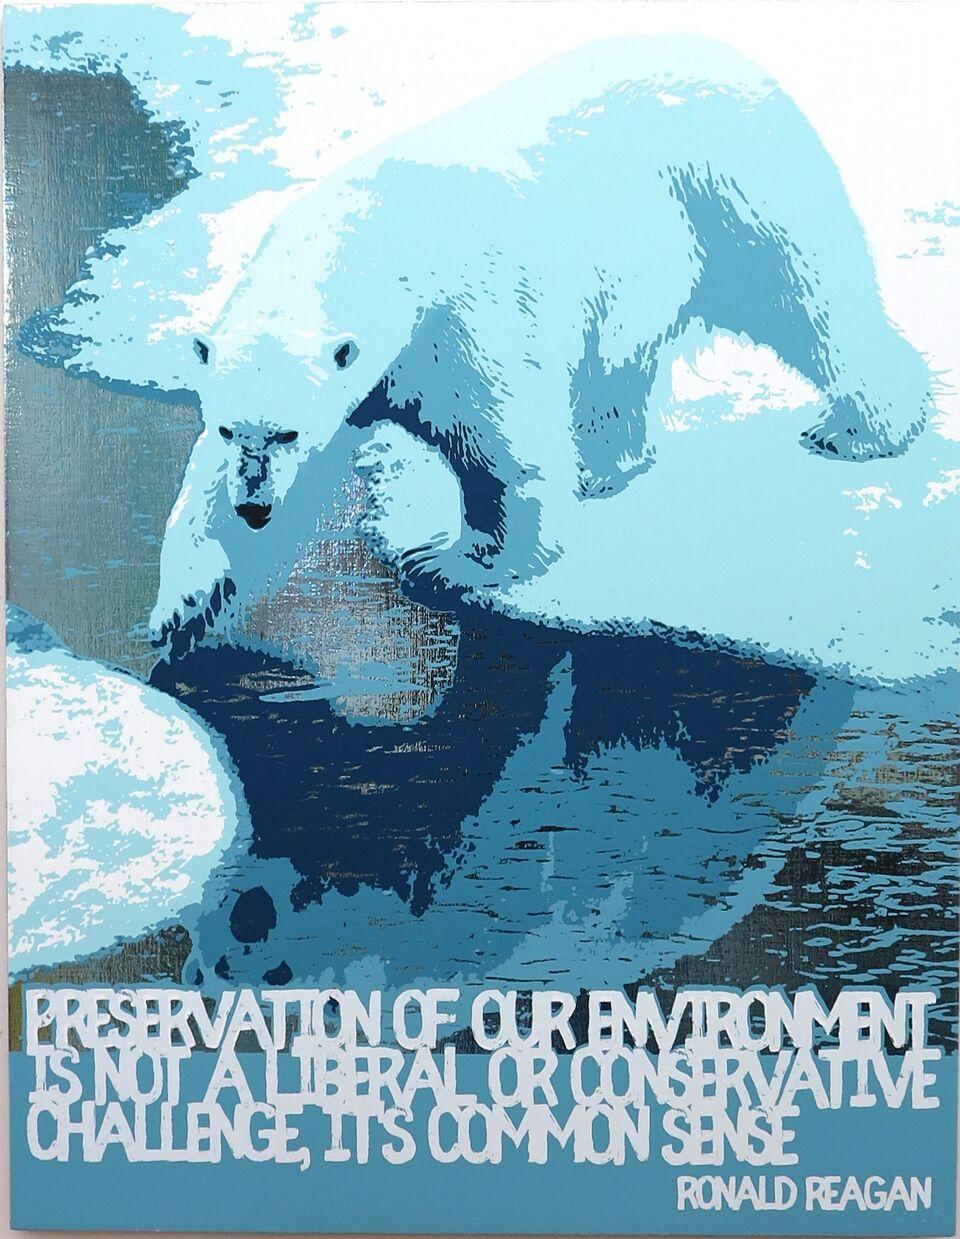 Polar Bear/Global Warming (Ronald Reagan)